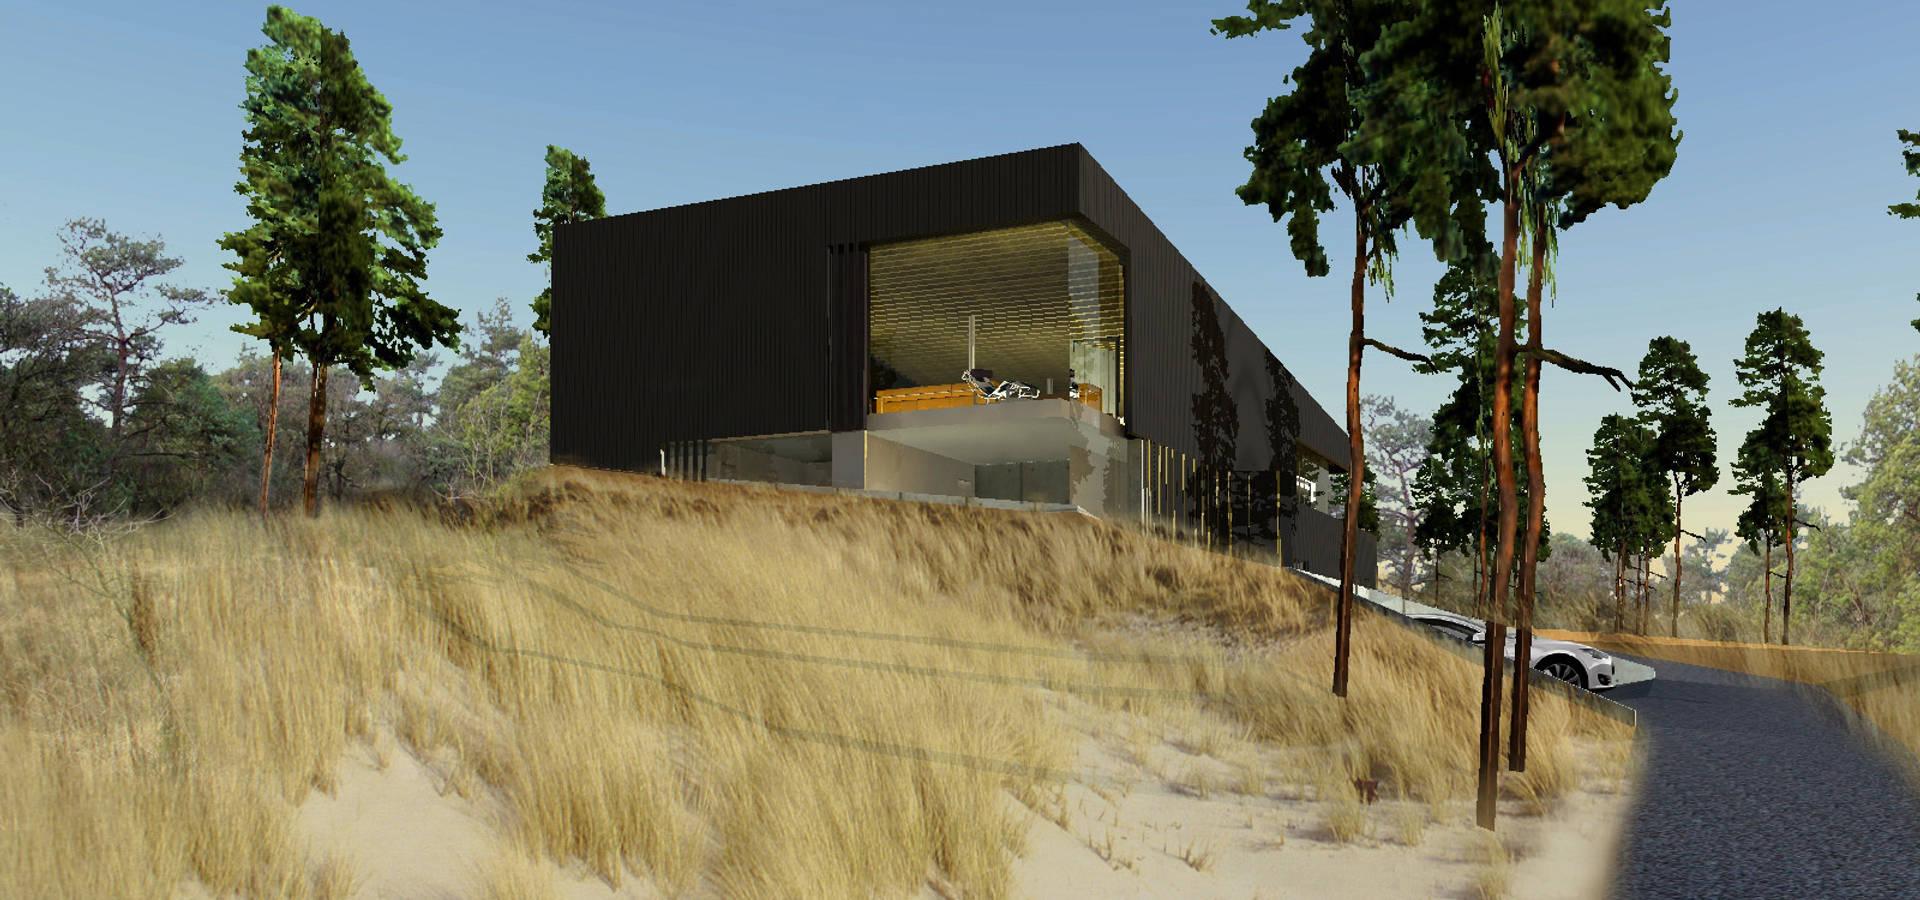 VVKH Architecten